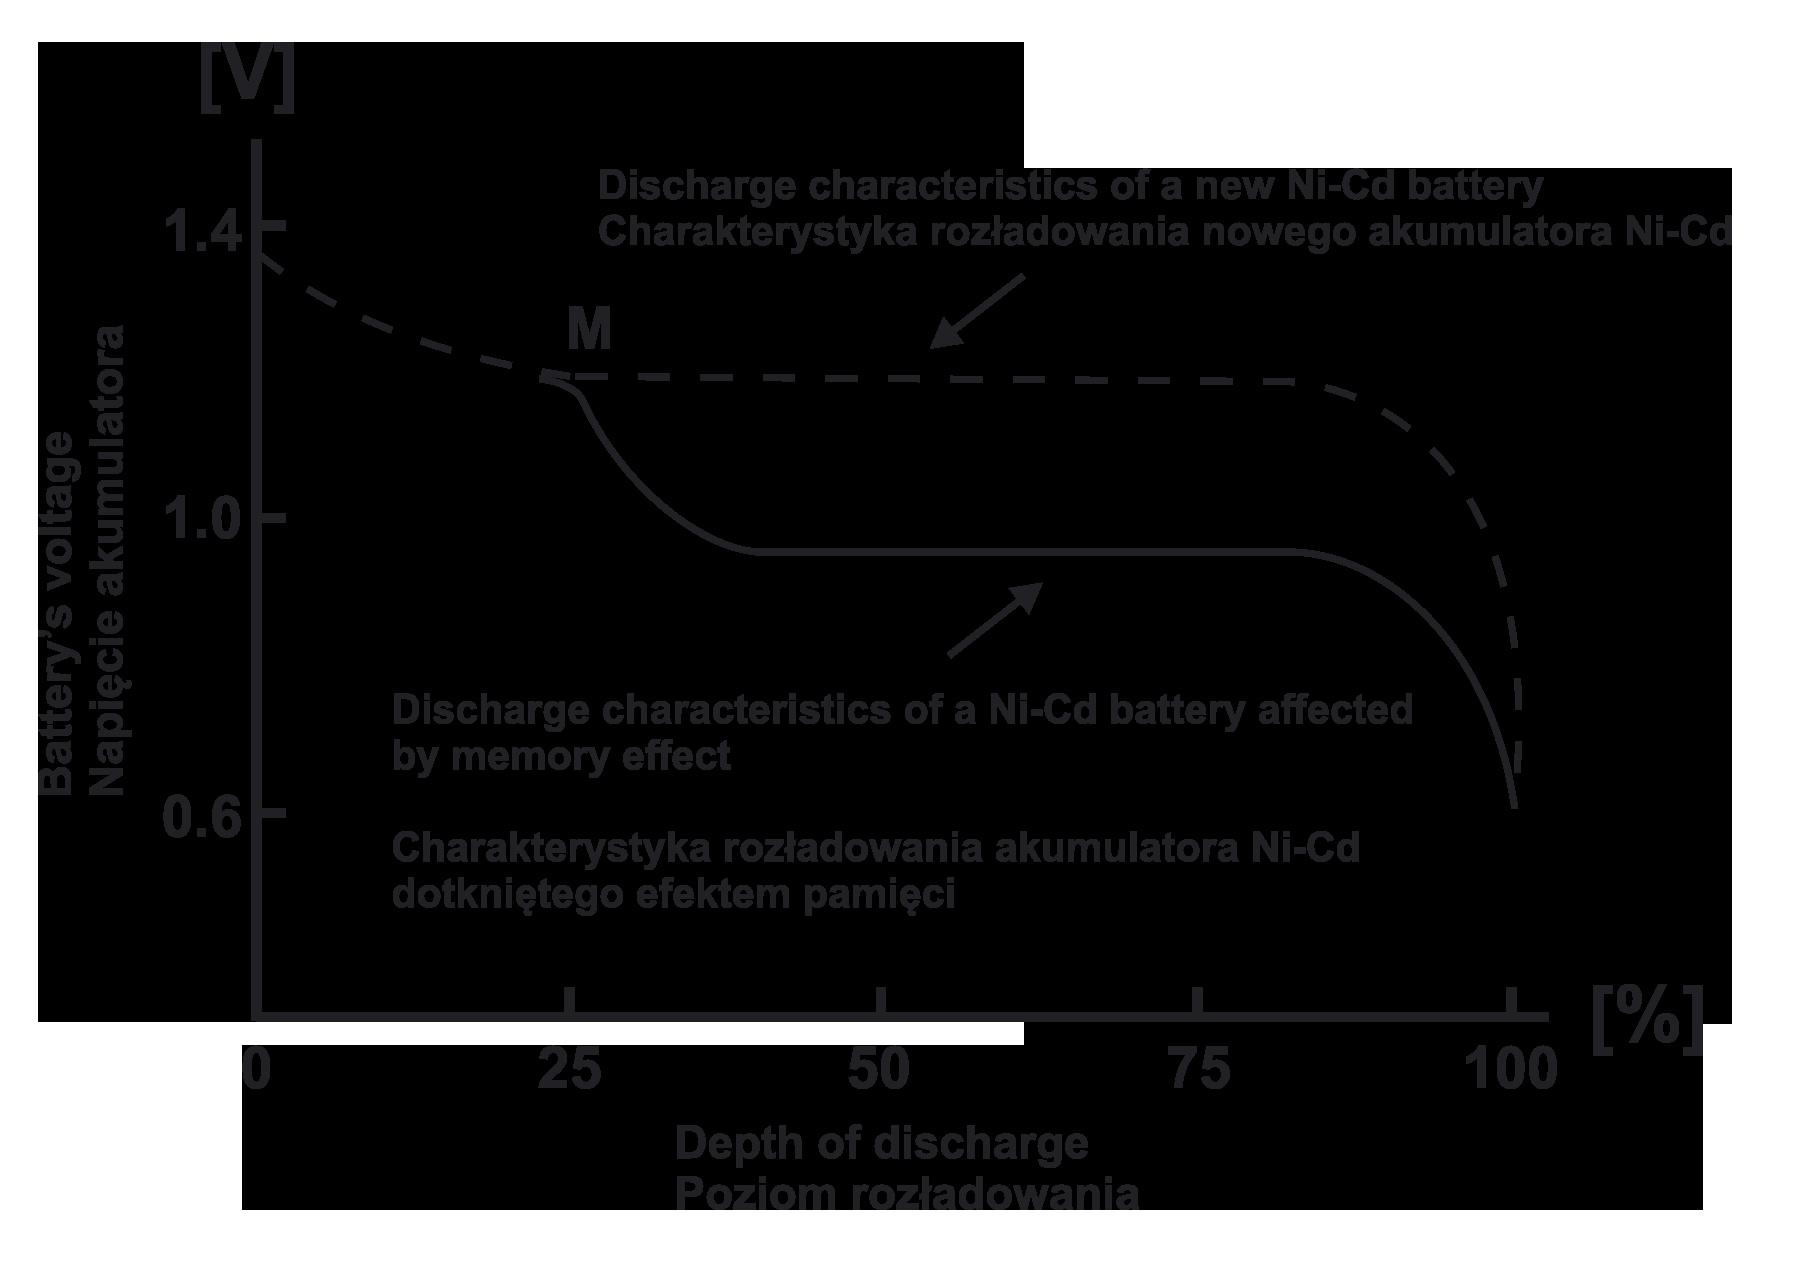 efekt pamięci w akumulatorach Ni-Cd